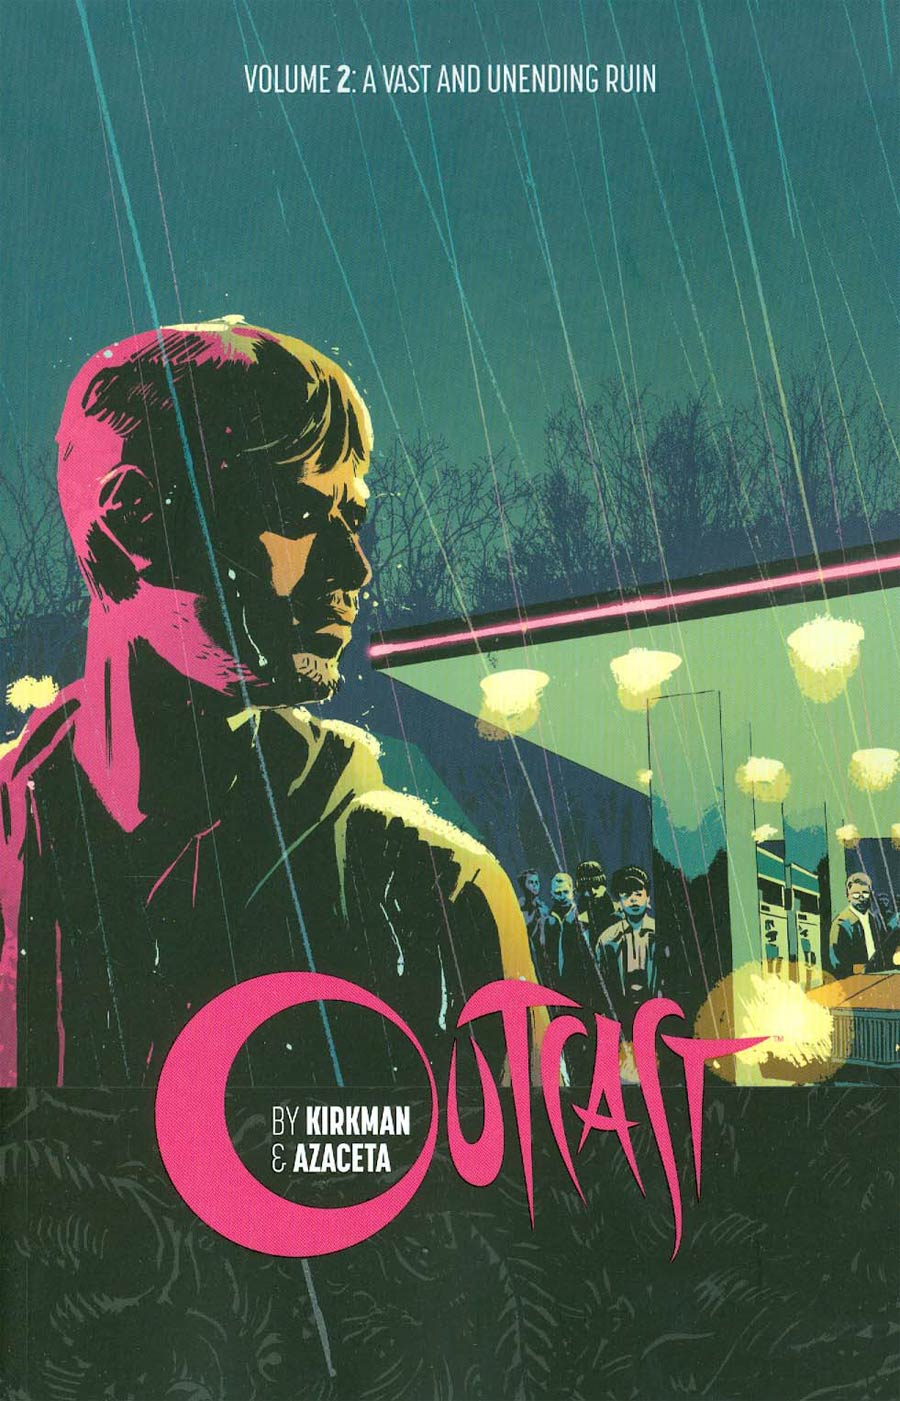 Outcast By Kirkman & Azaceta Vol 2 A Vast And Unending Ruin TP